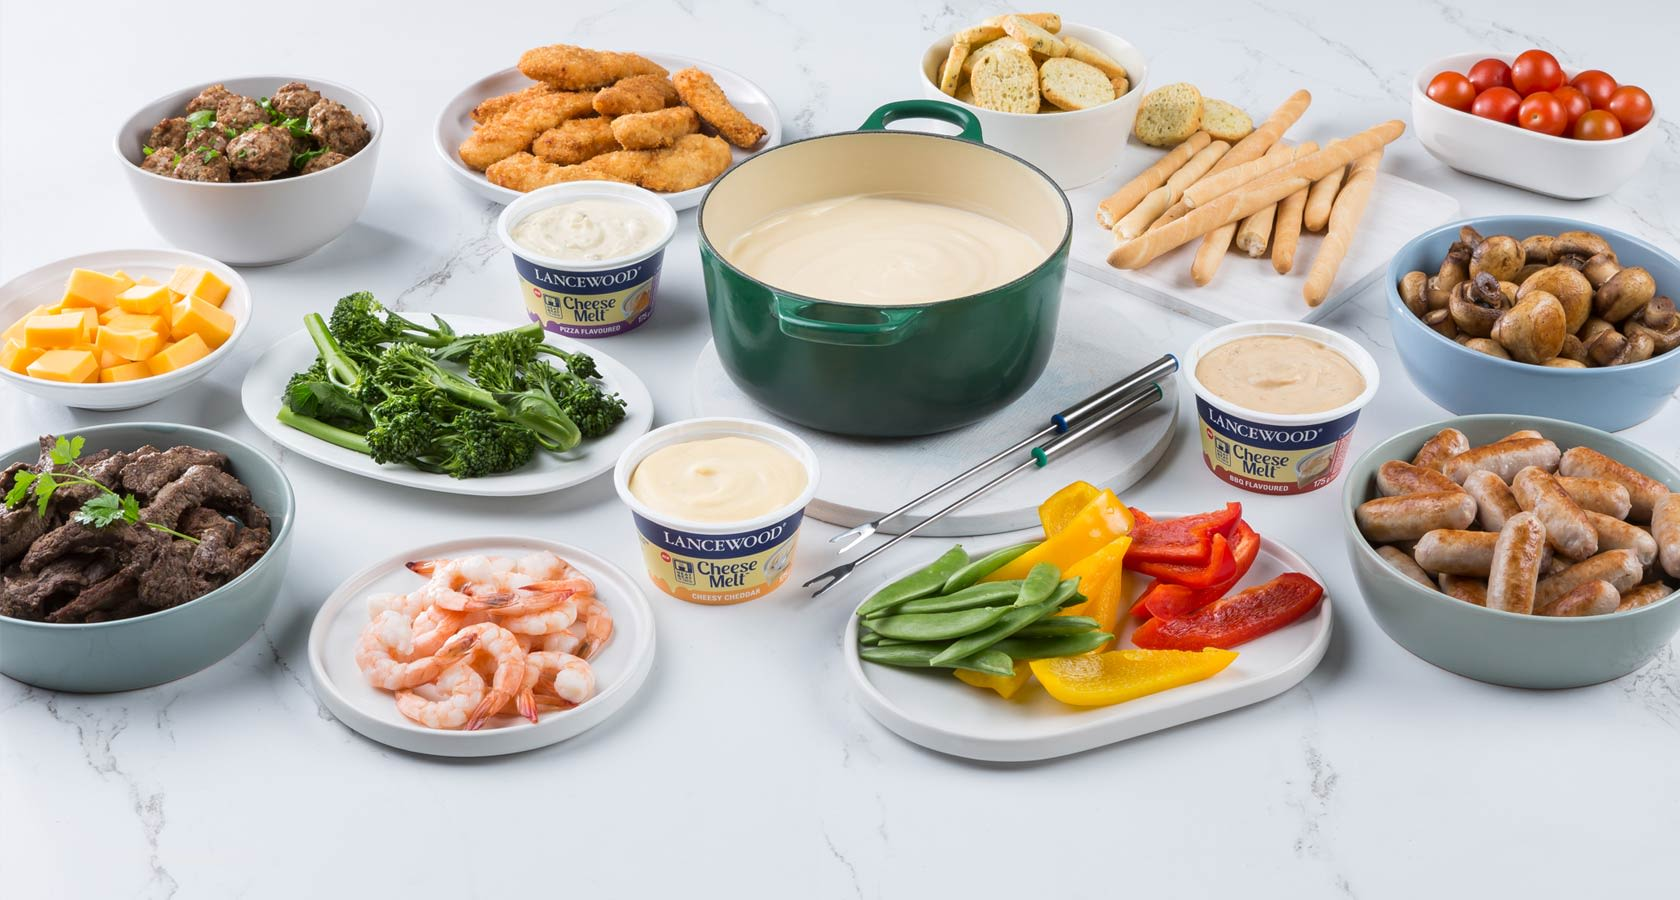 Cheese Melt™ Heat & Eat